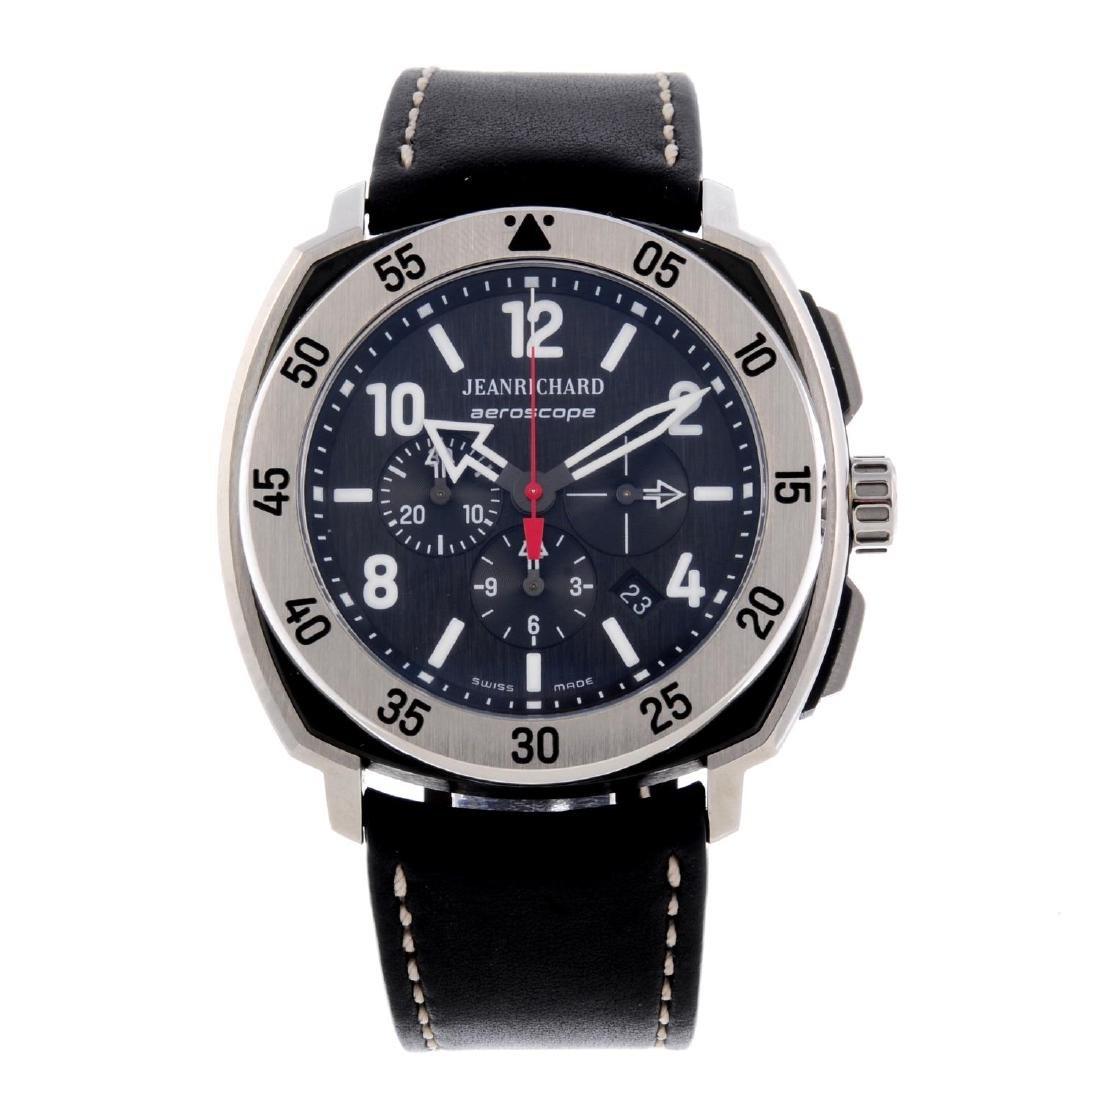 JEANRICHARD - a gentleman's Aeroscope chronograph wrist